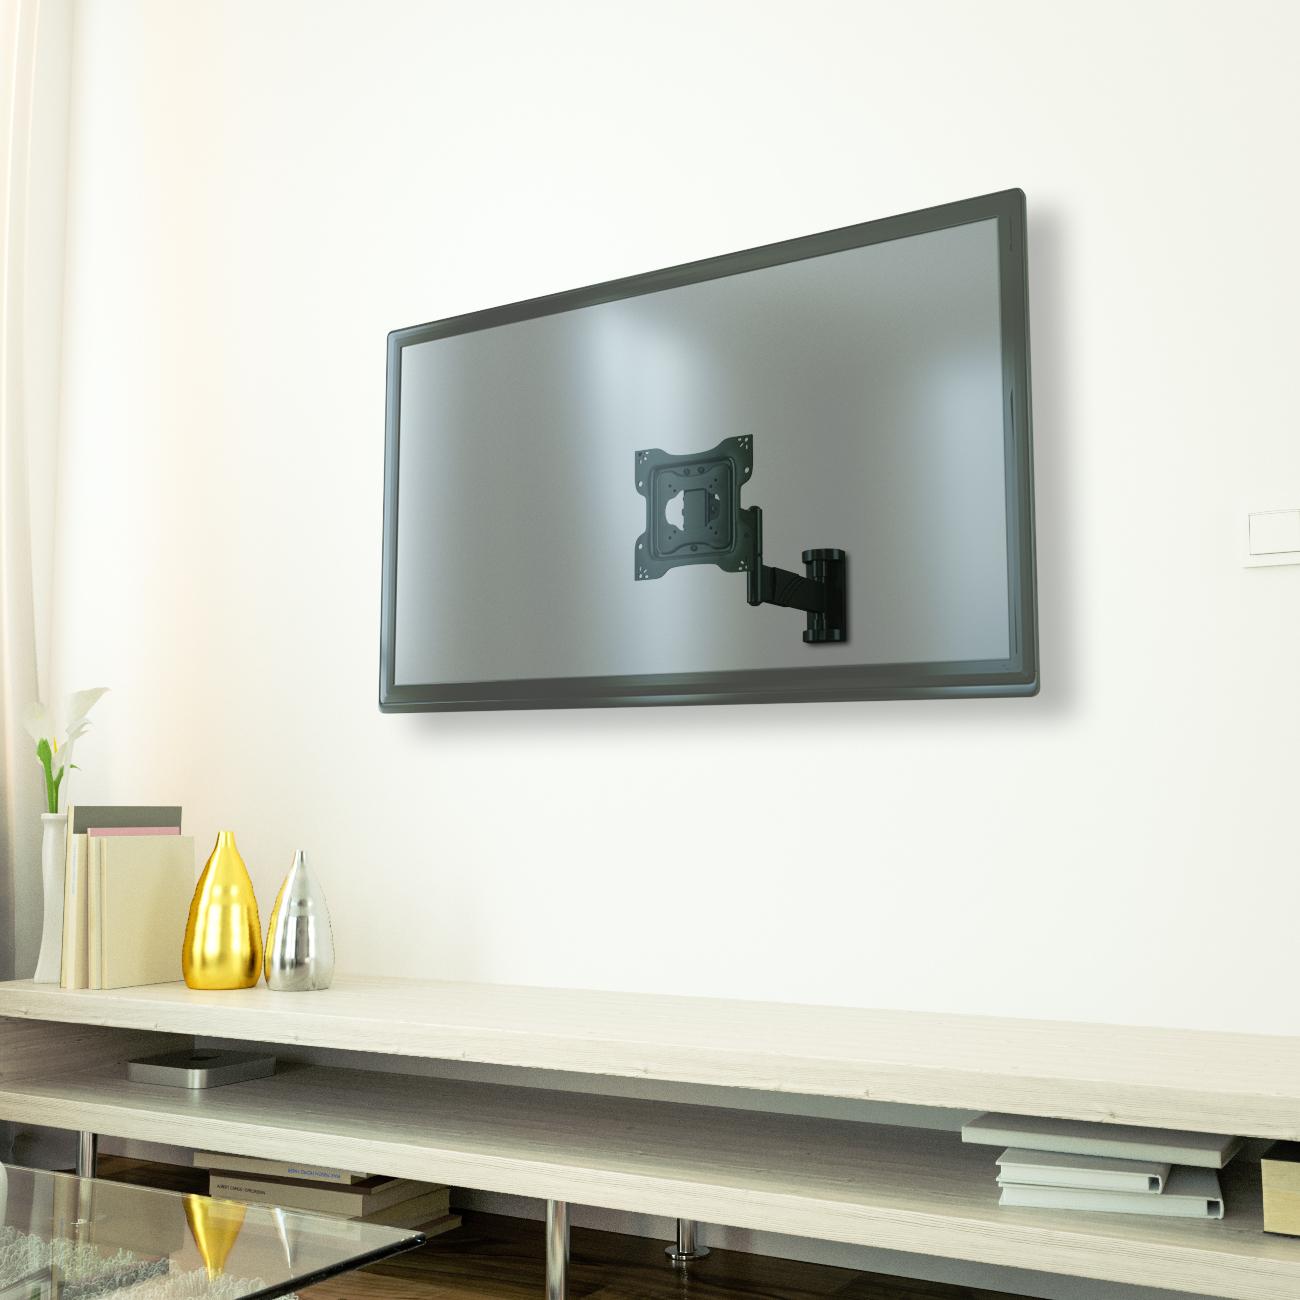 lcd led tv fernseher wandhalter wandhalterung 26 55 zoll neigbar schwenkbar ebay. Black Bedroom Furniture Sets. Home Design Ideas